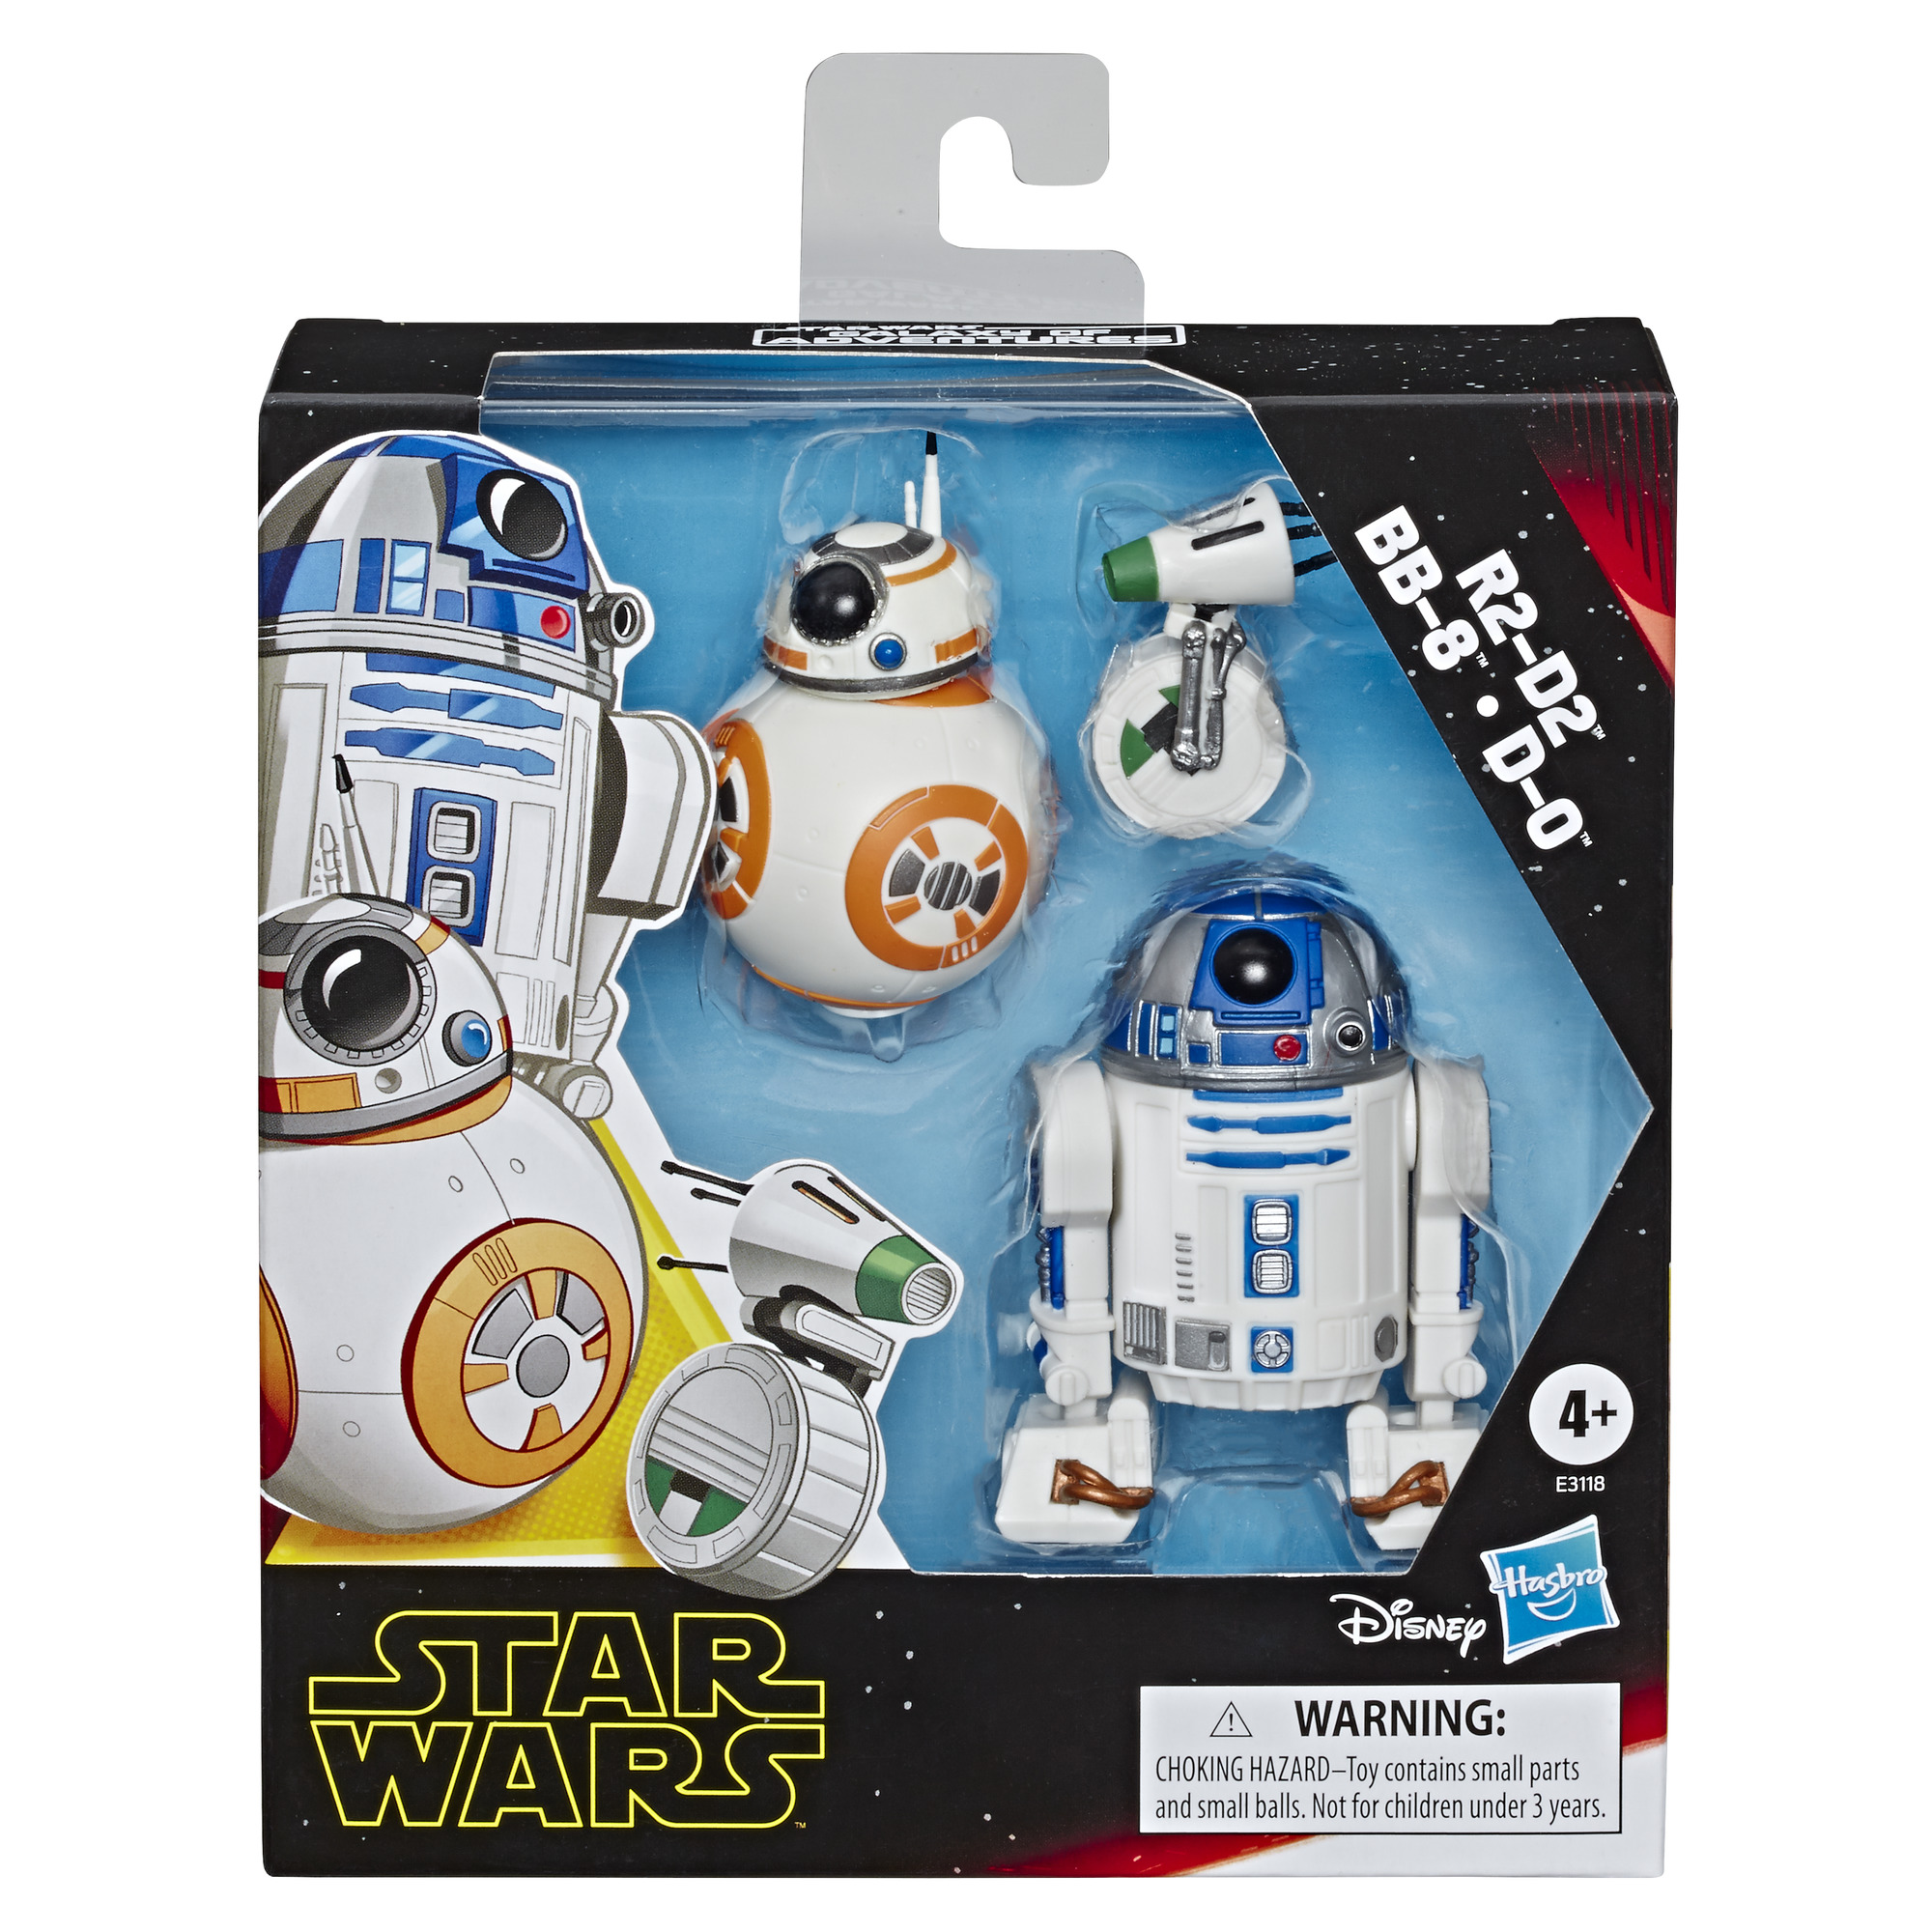 TROS Galaxy of Adventures R2-D2, BB-8, D-O Figure 3-Pack 1